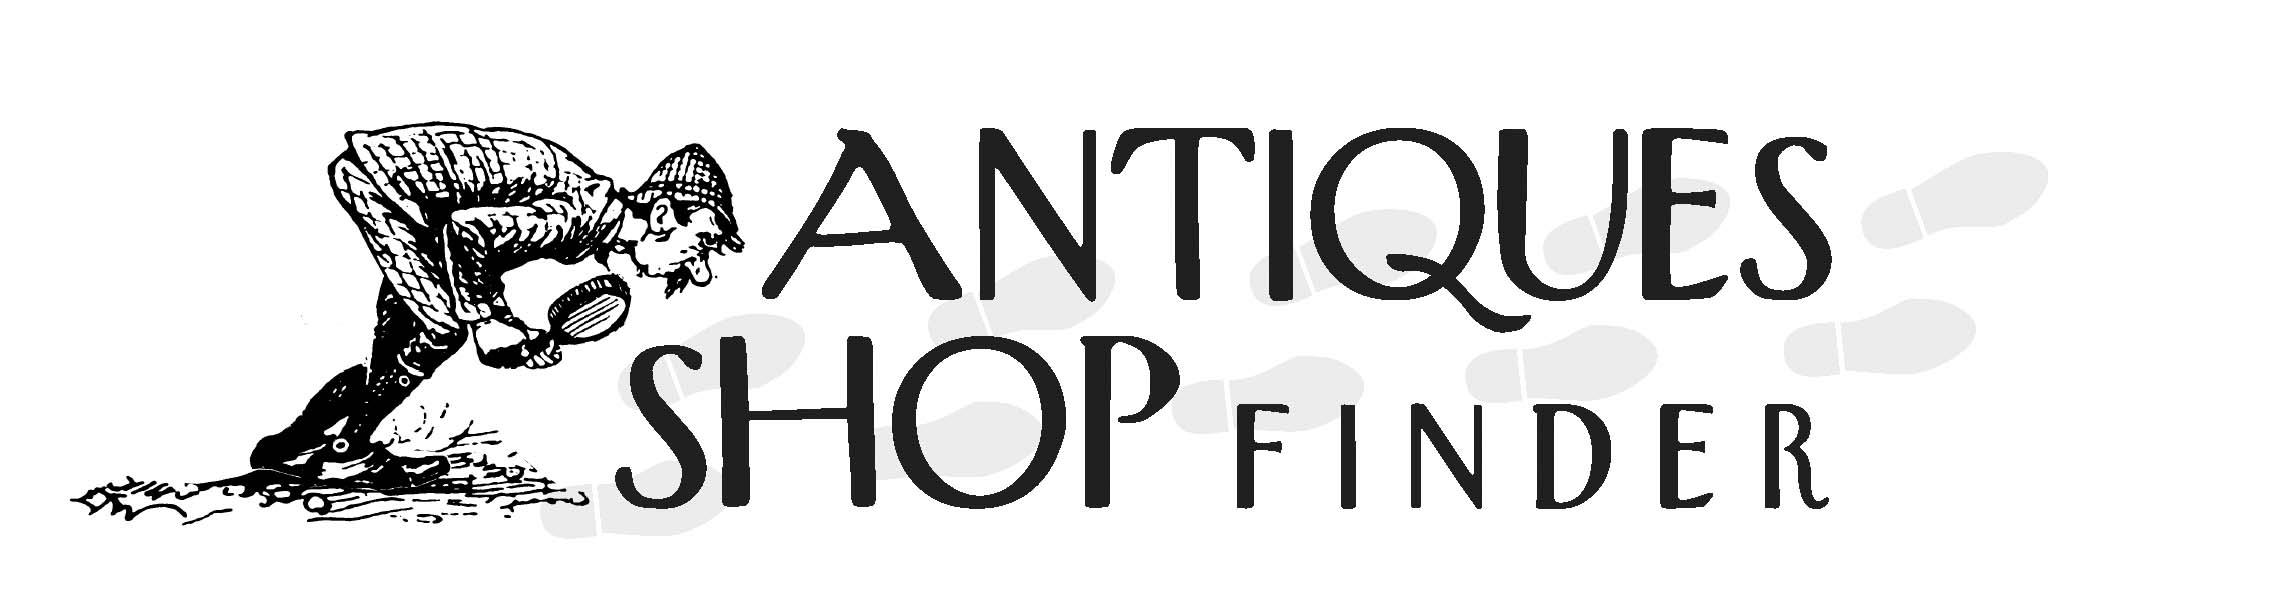 Journal of Antiques - Antiques Shop Finder